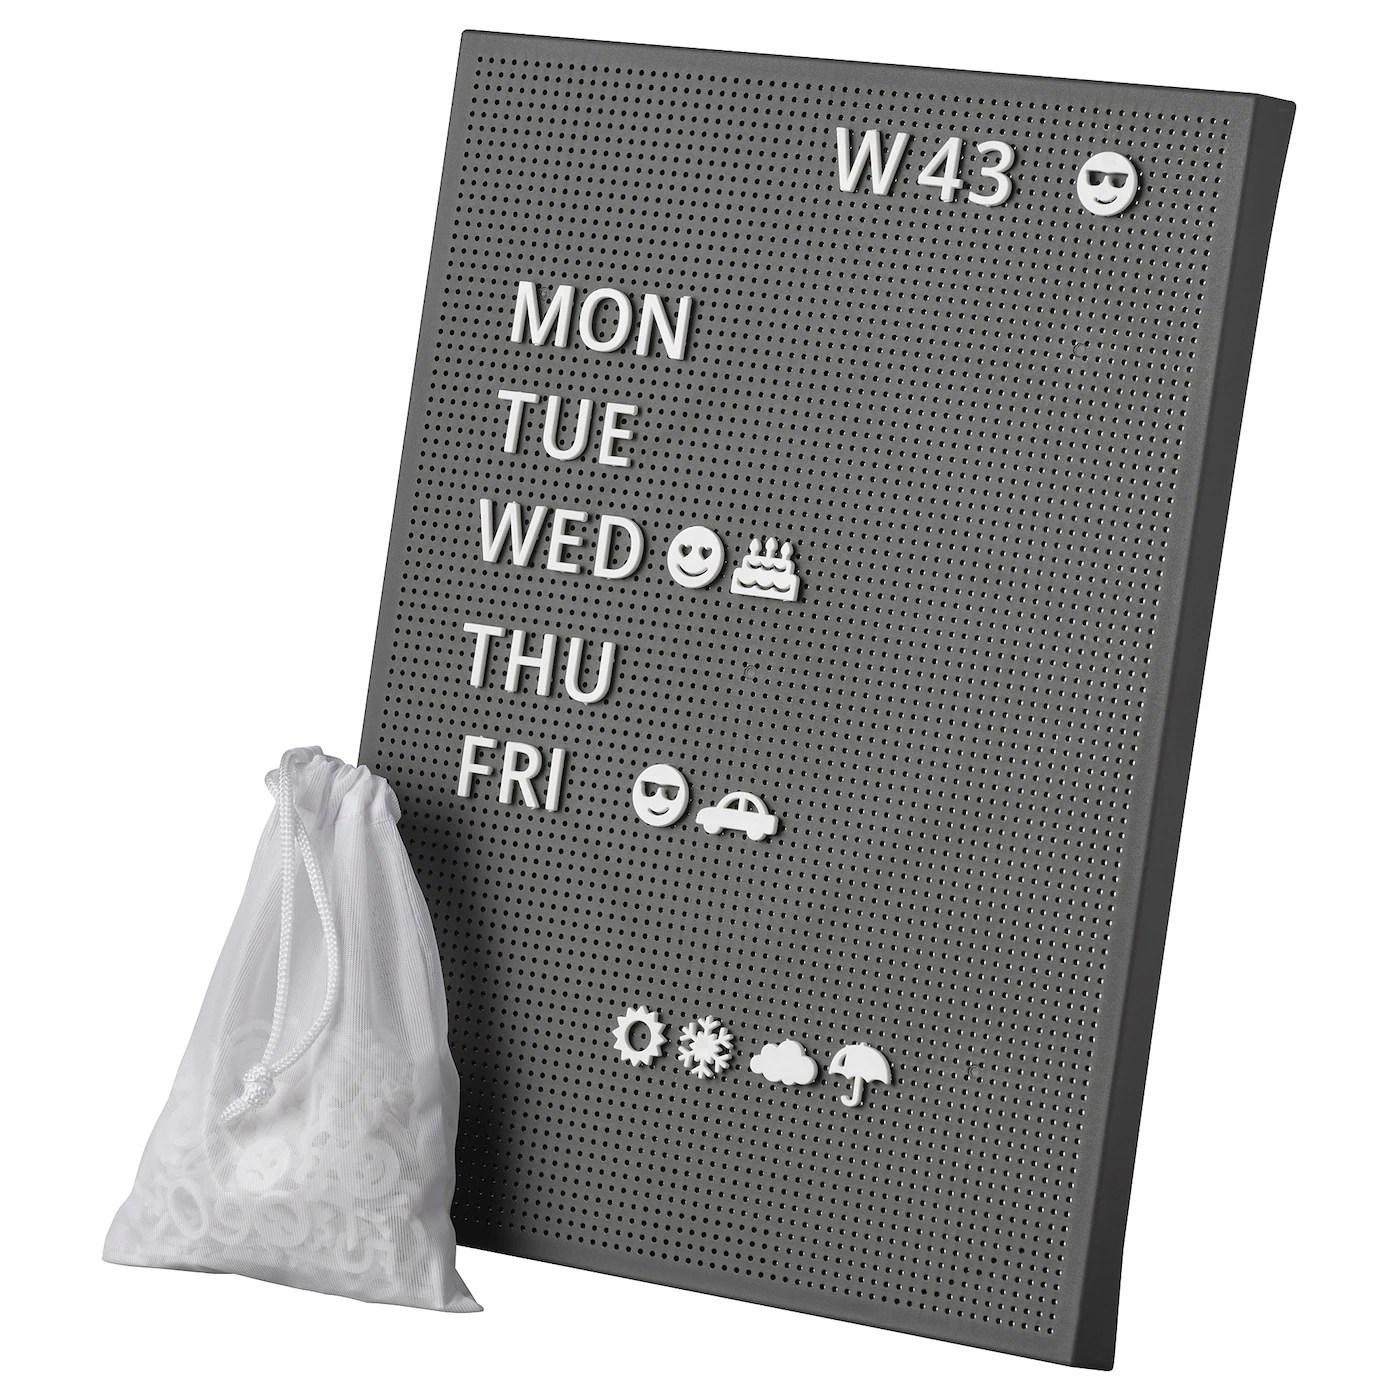 Tableaux D Affichage Ikea